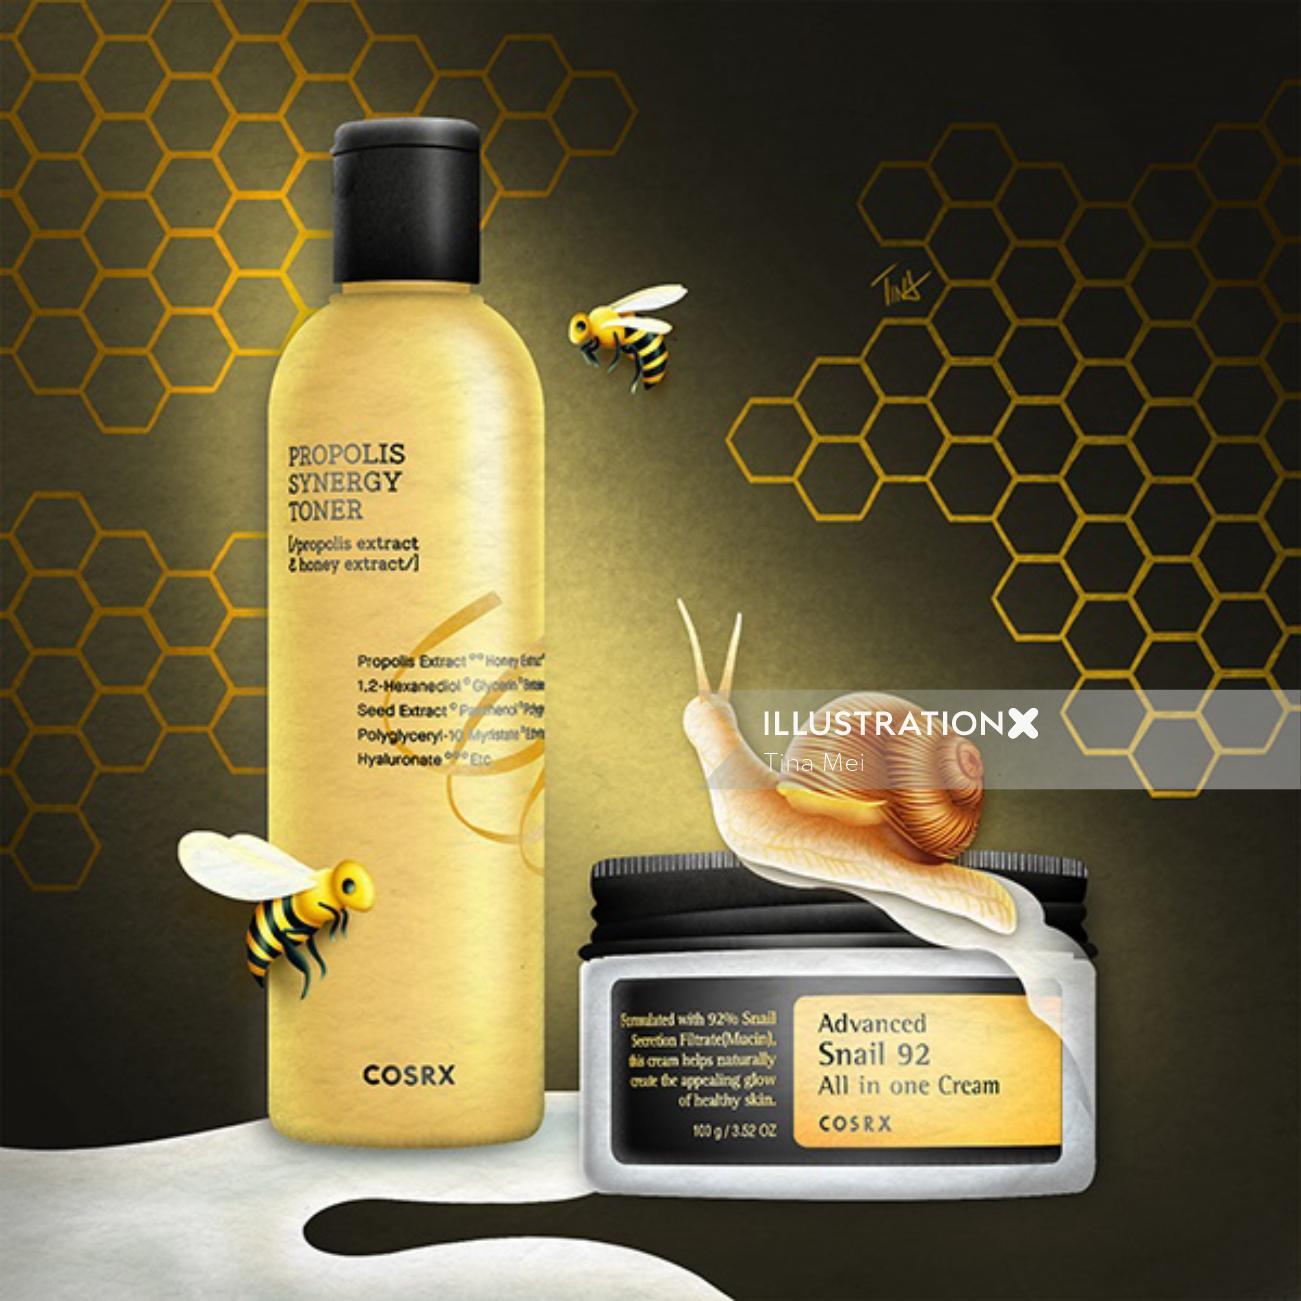 cosrx, bee venom skincare, propolis, snail skincare, korean beauty, korean skincare, skincare illust